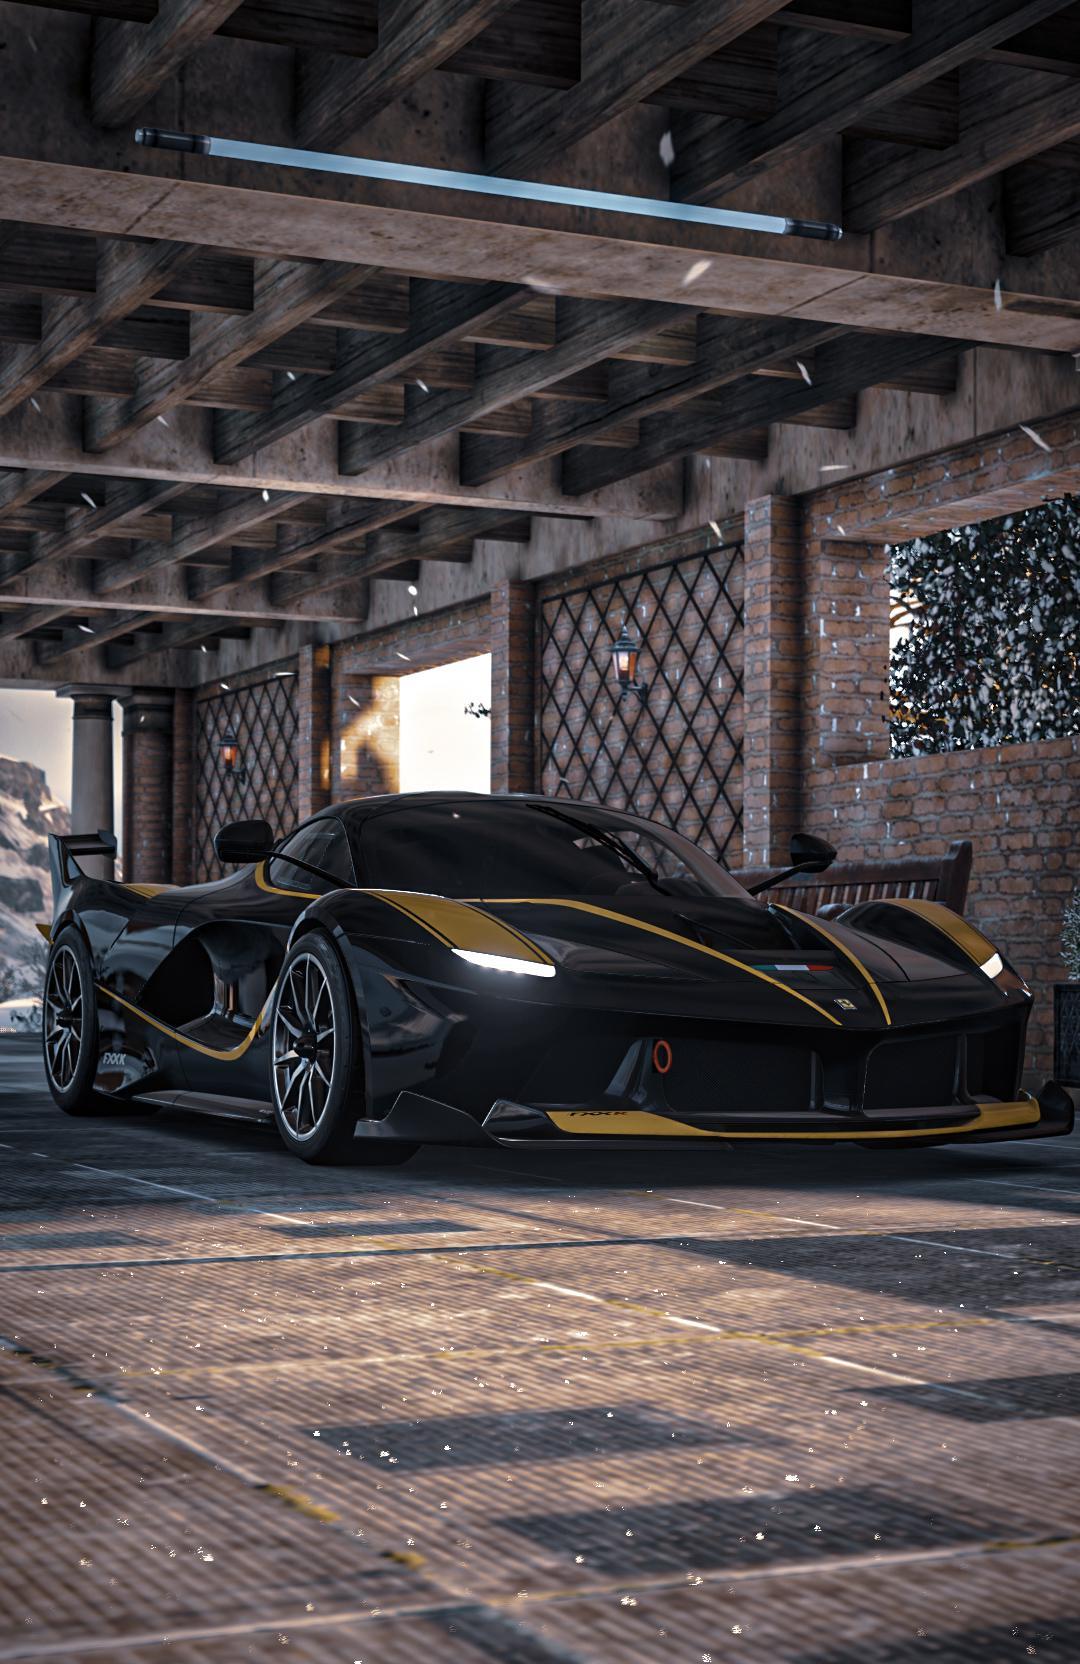 This Ferrari Fxx K Is Generation Z S Own Batmobile Autoevolution